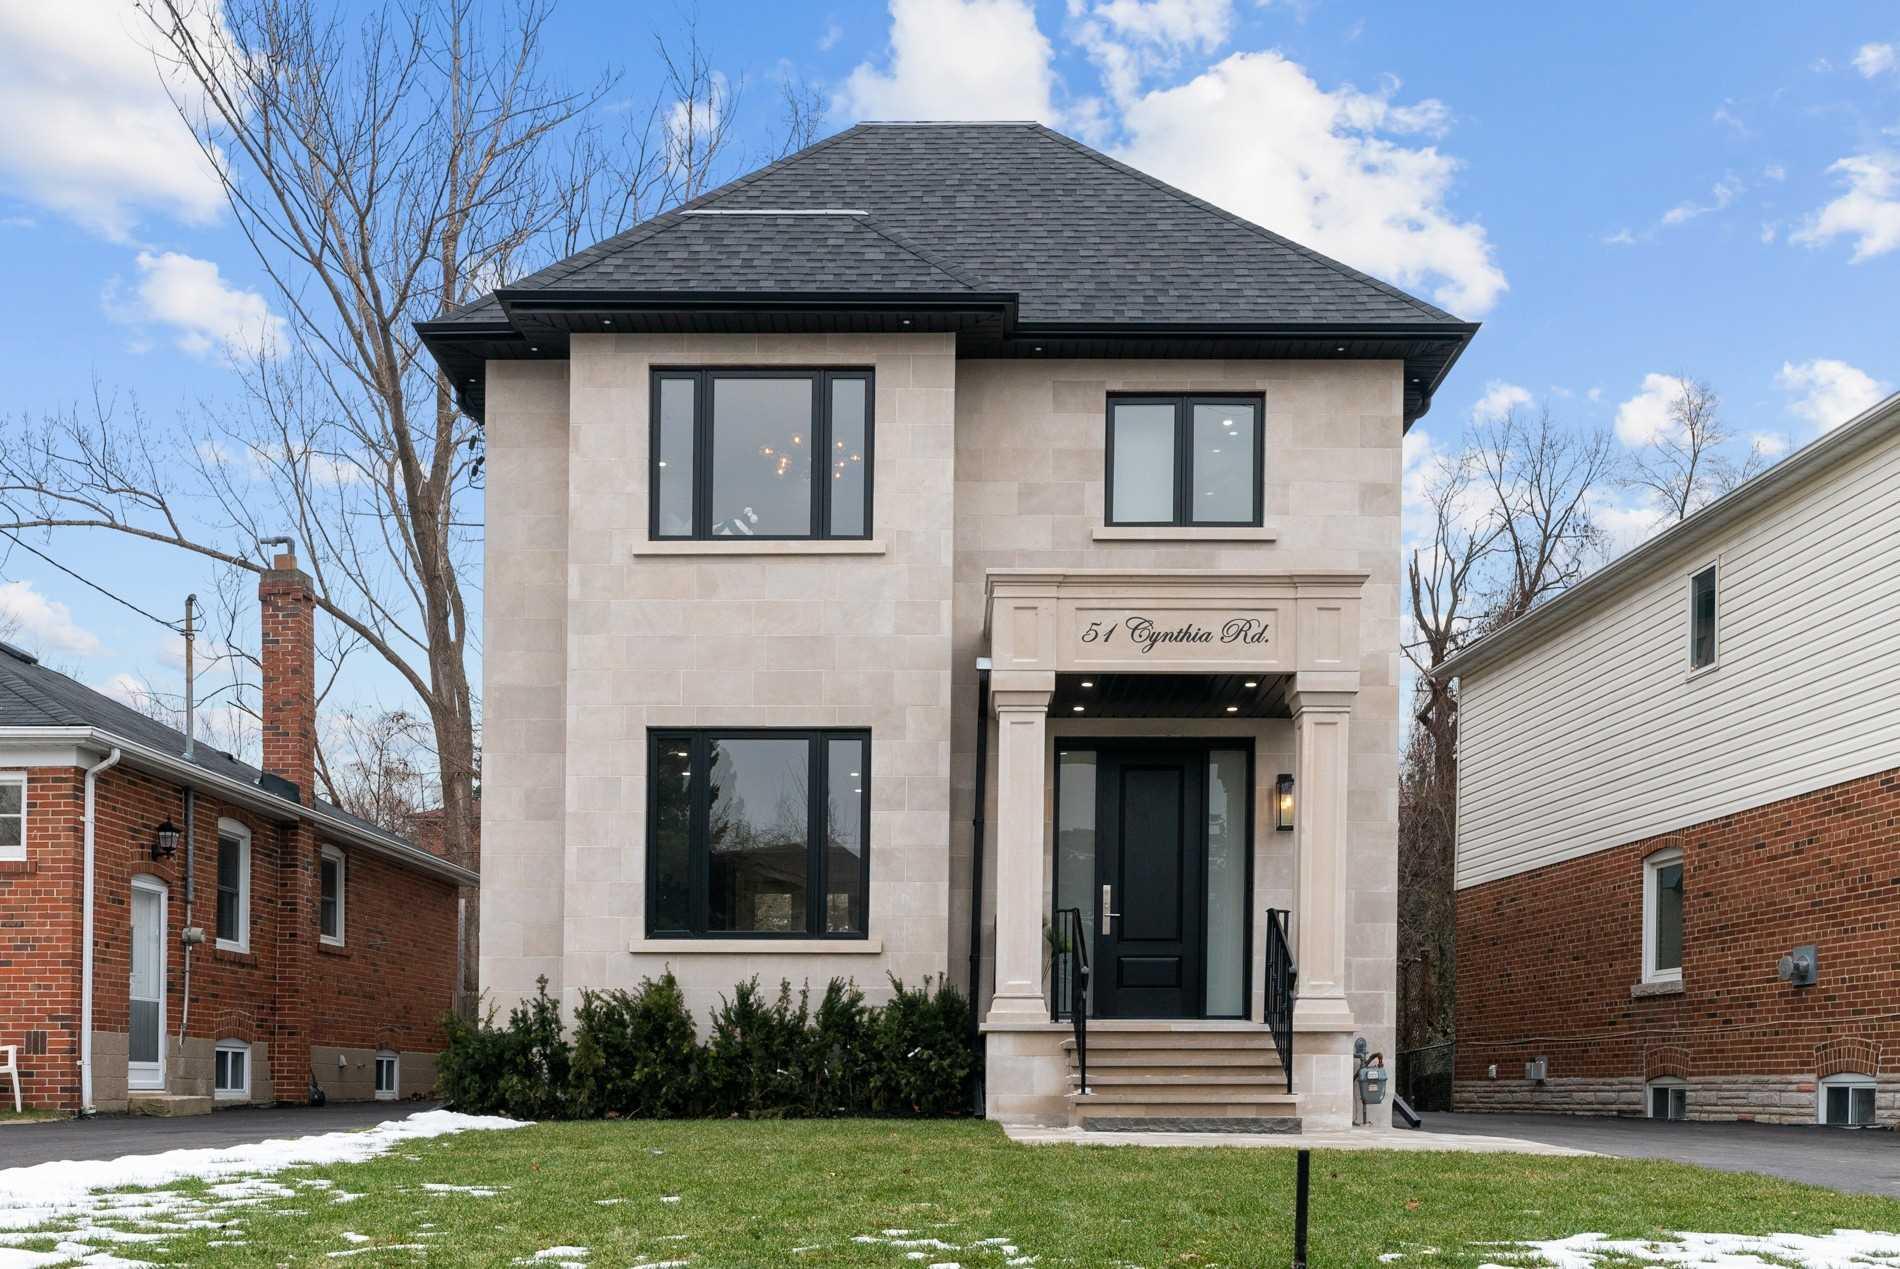 51 Cynthia Rd, Toronto, Ontario M6N2P8, 4 Bedrooms Bedrooms, 7 Rooms Rooms,5 BathroomsBathrooms,Detached,For Sale,Cynthia,W5085811